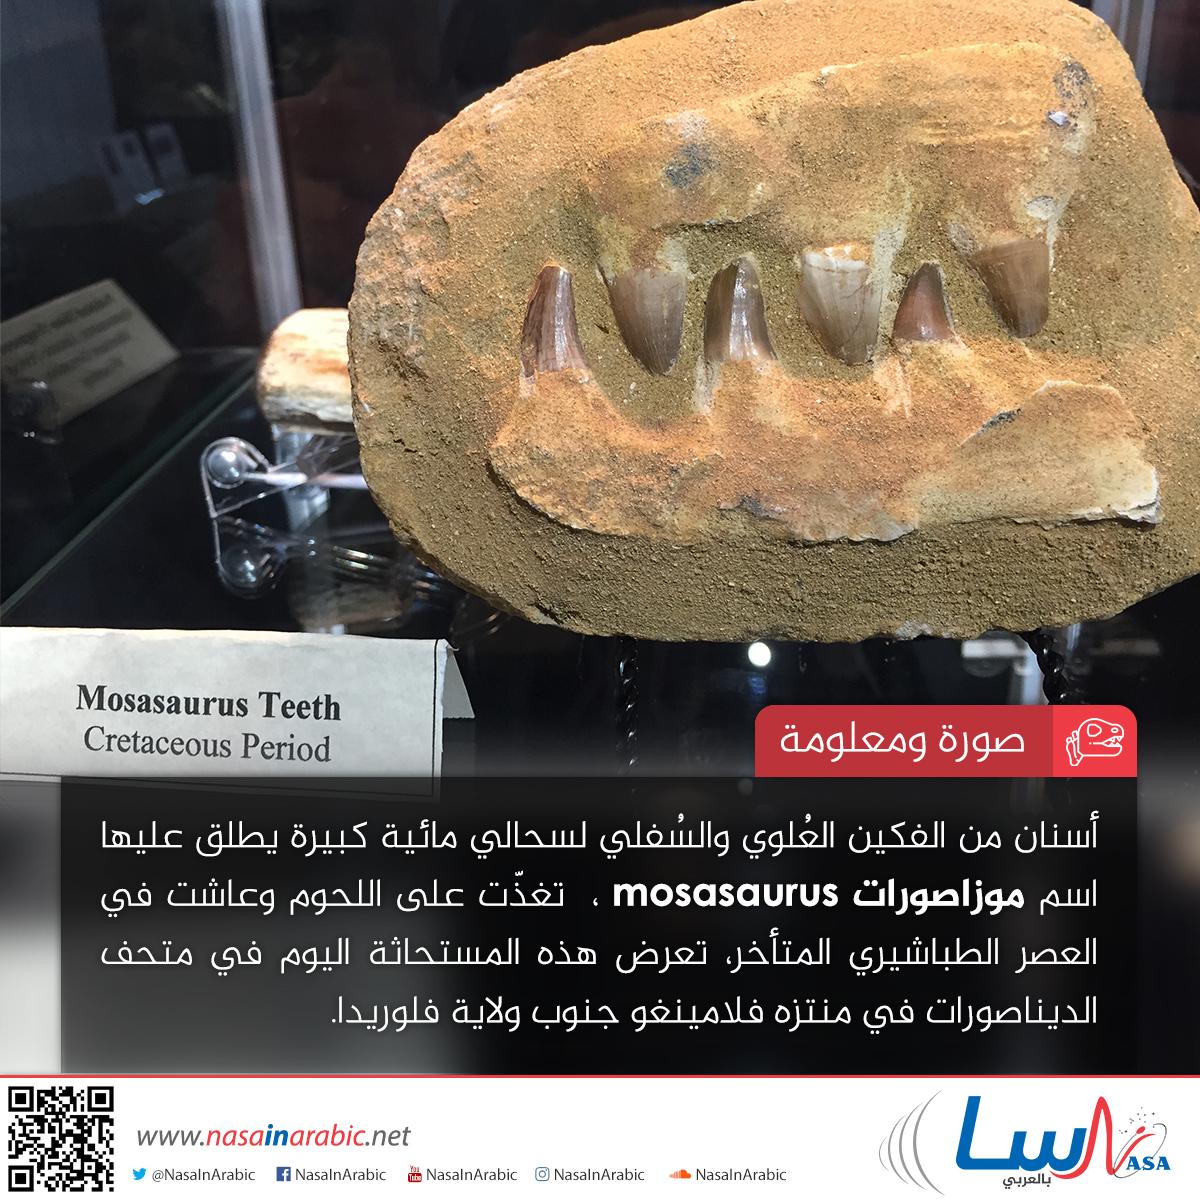 موزاصورات Mosasaurus